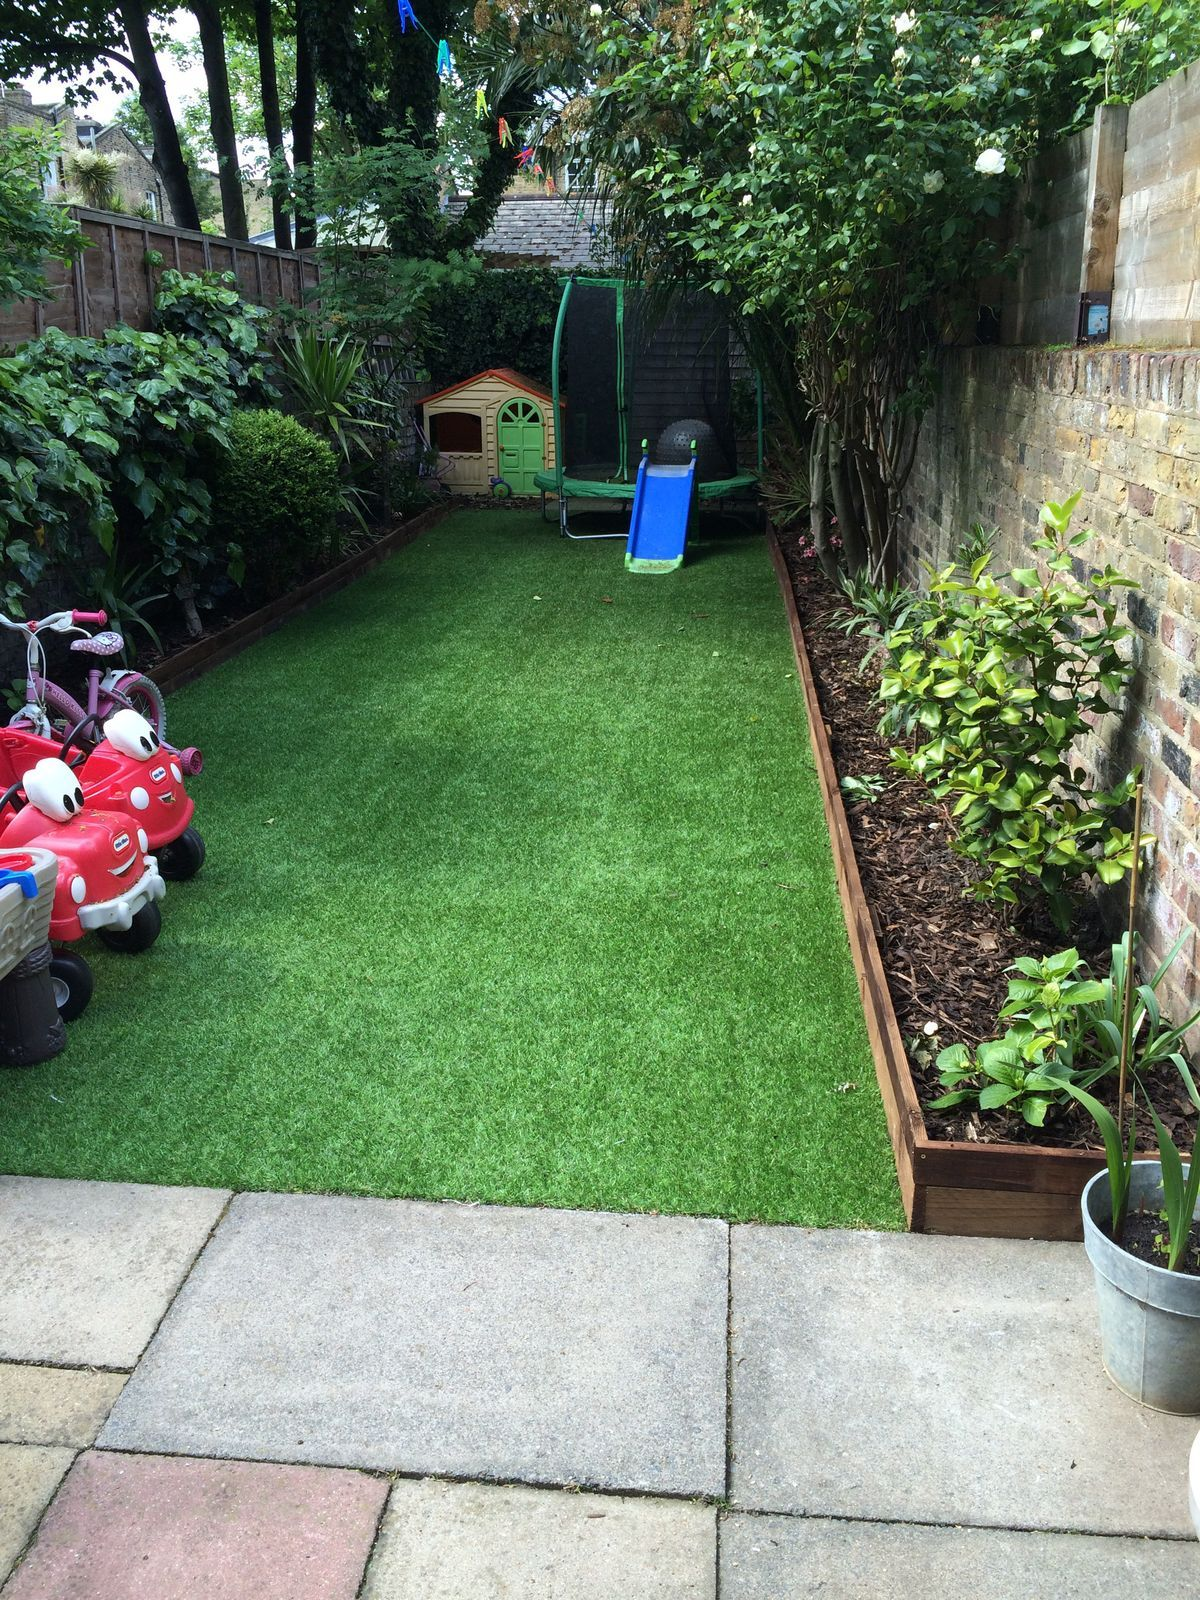 25+ Awesome Small Backyard Ideas - decoratoo on Small Backyard Ideas id=24239